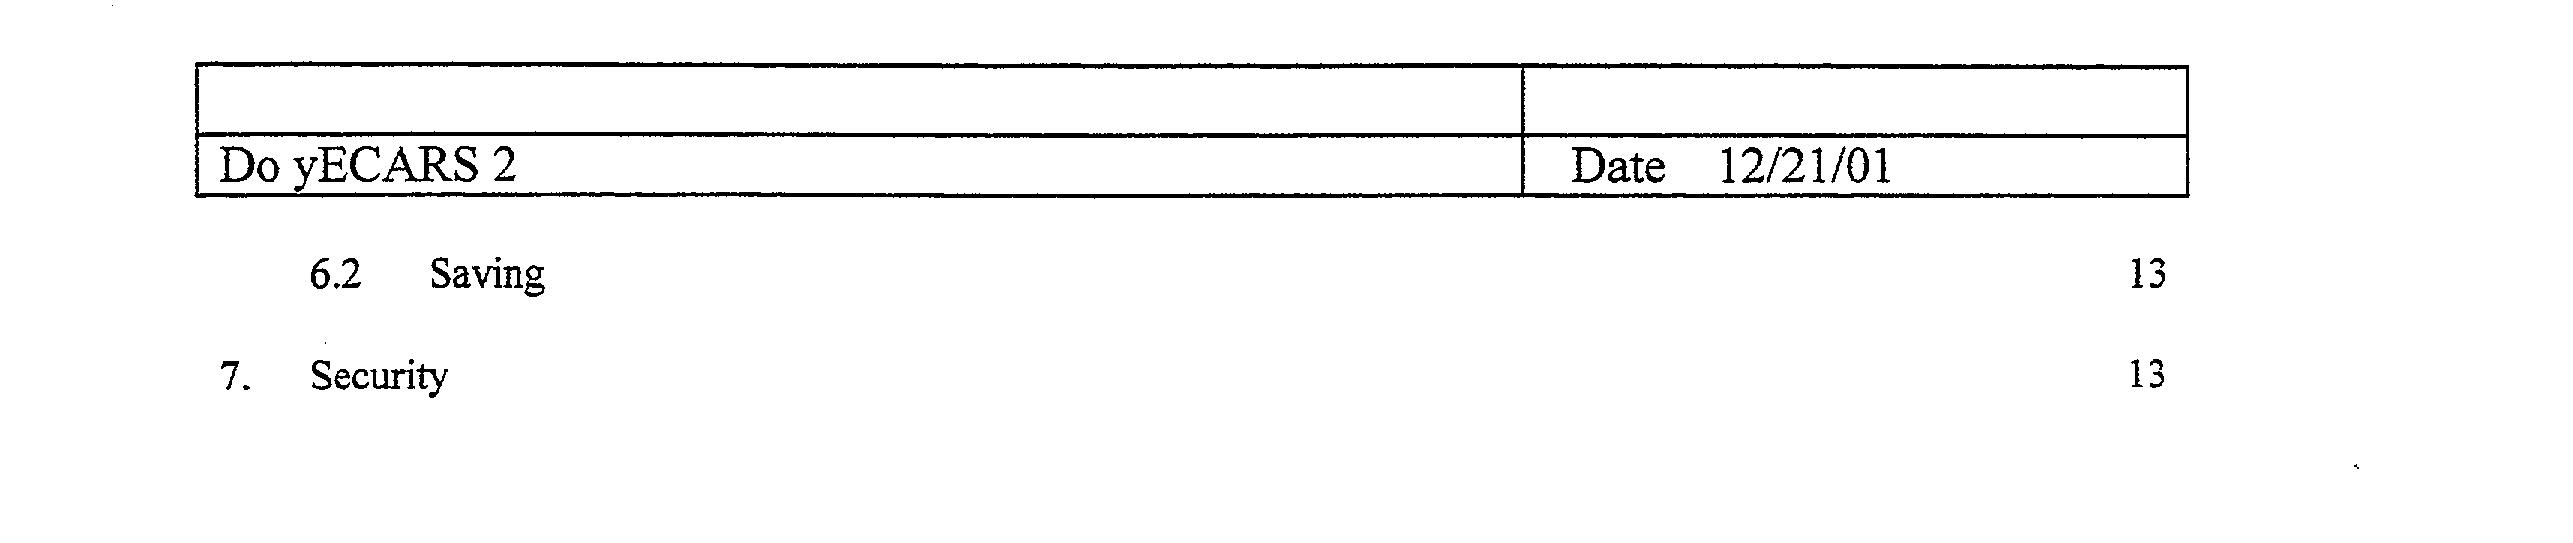 Figure US20030125992A1-20030703-P00468